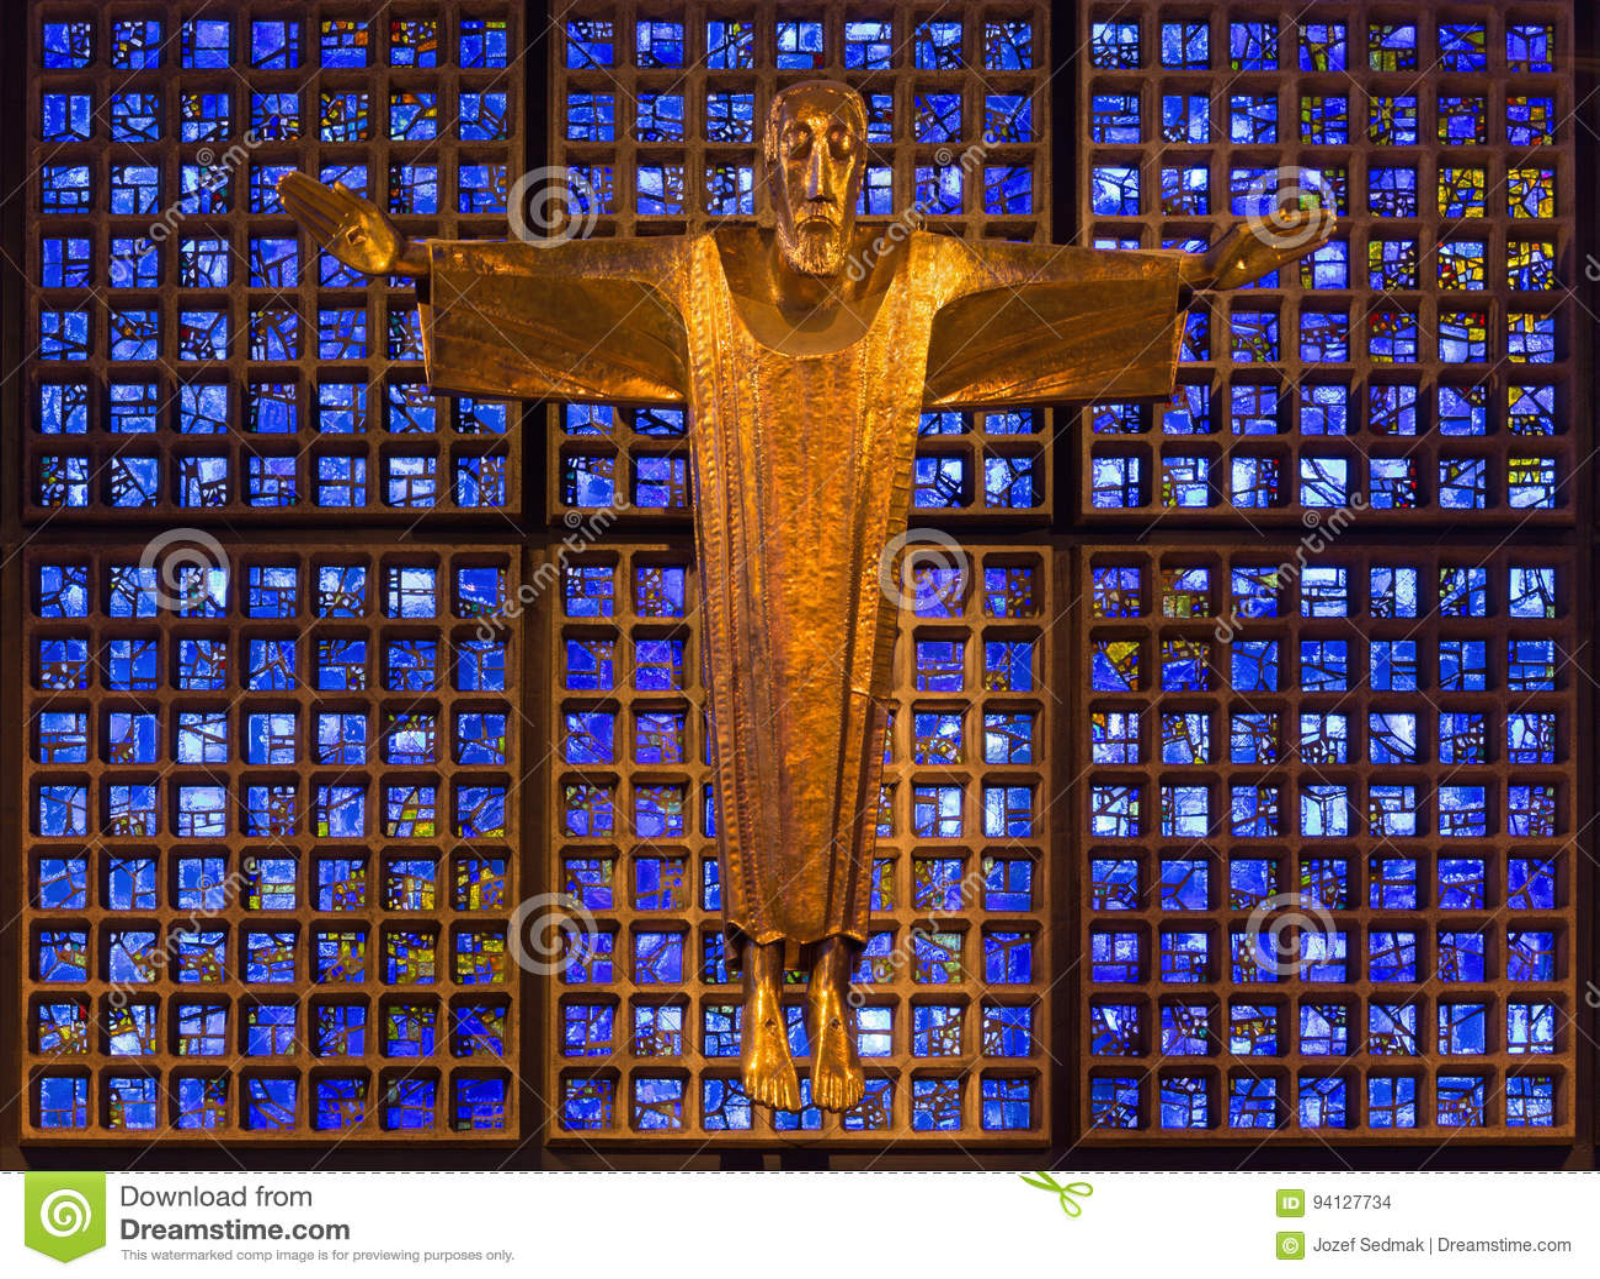 Berlin Germany February 15 2017 The Modern Jesus Christ Statue